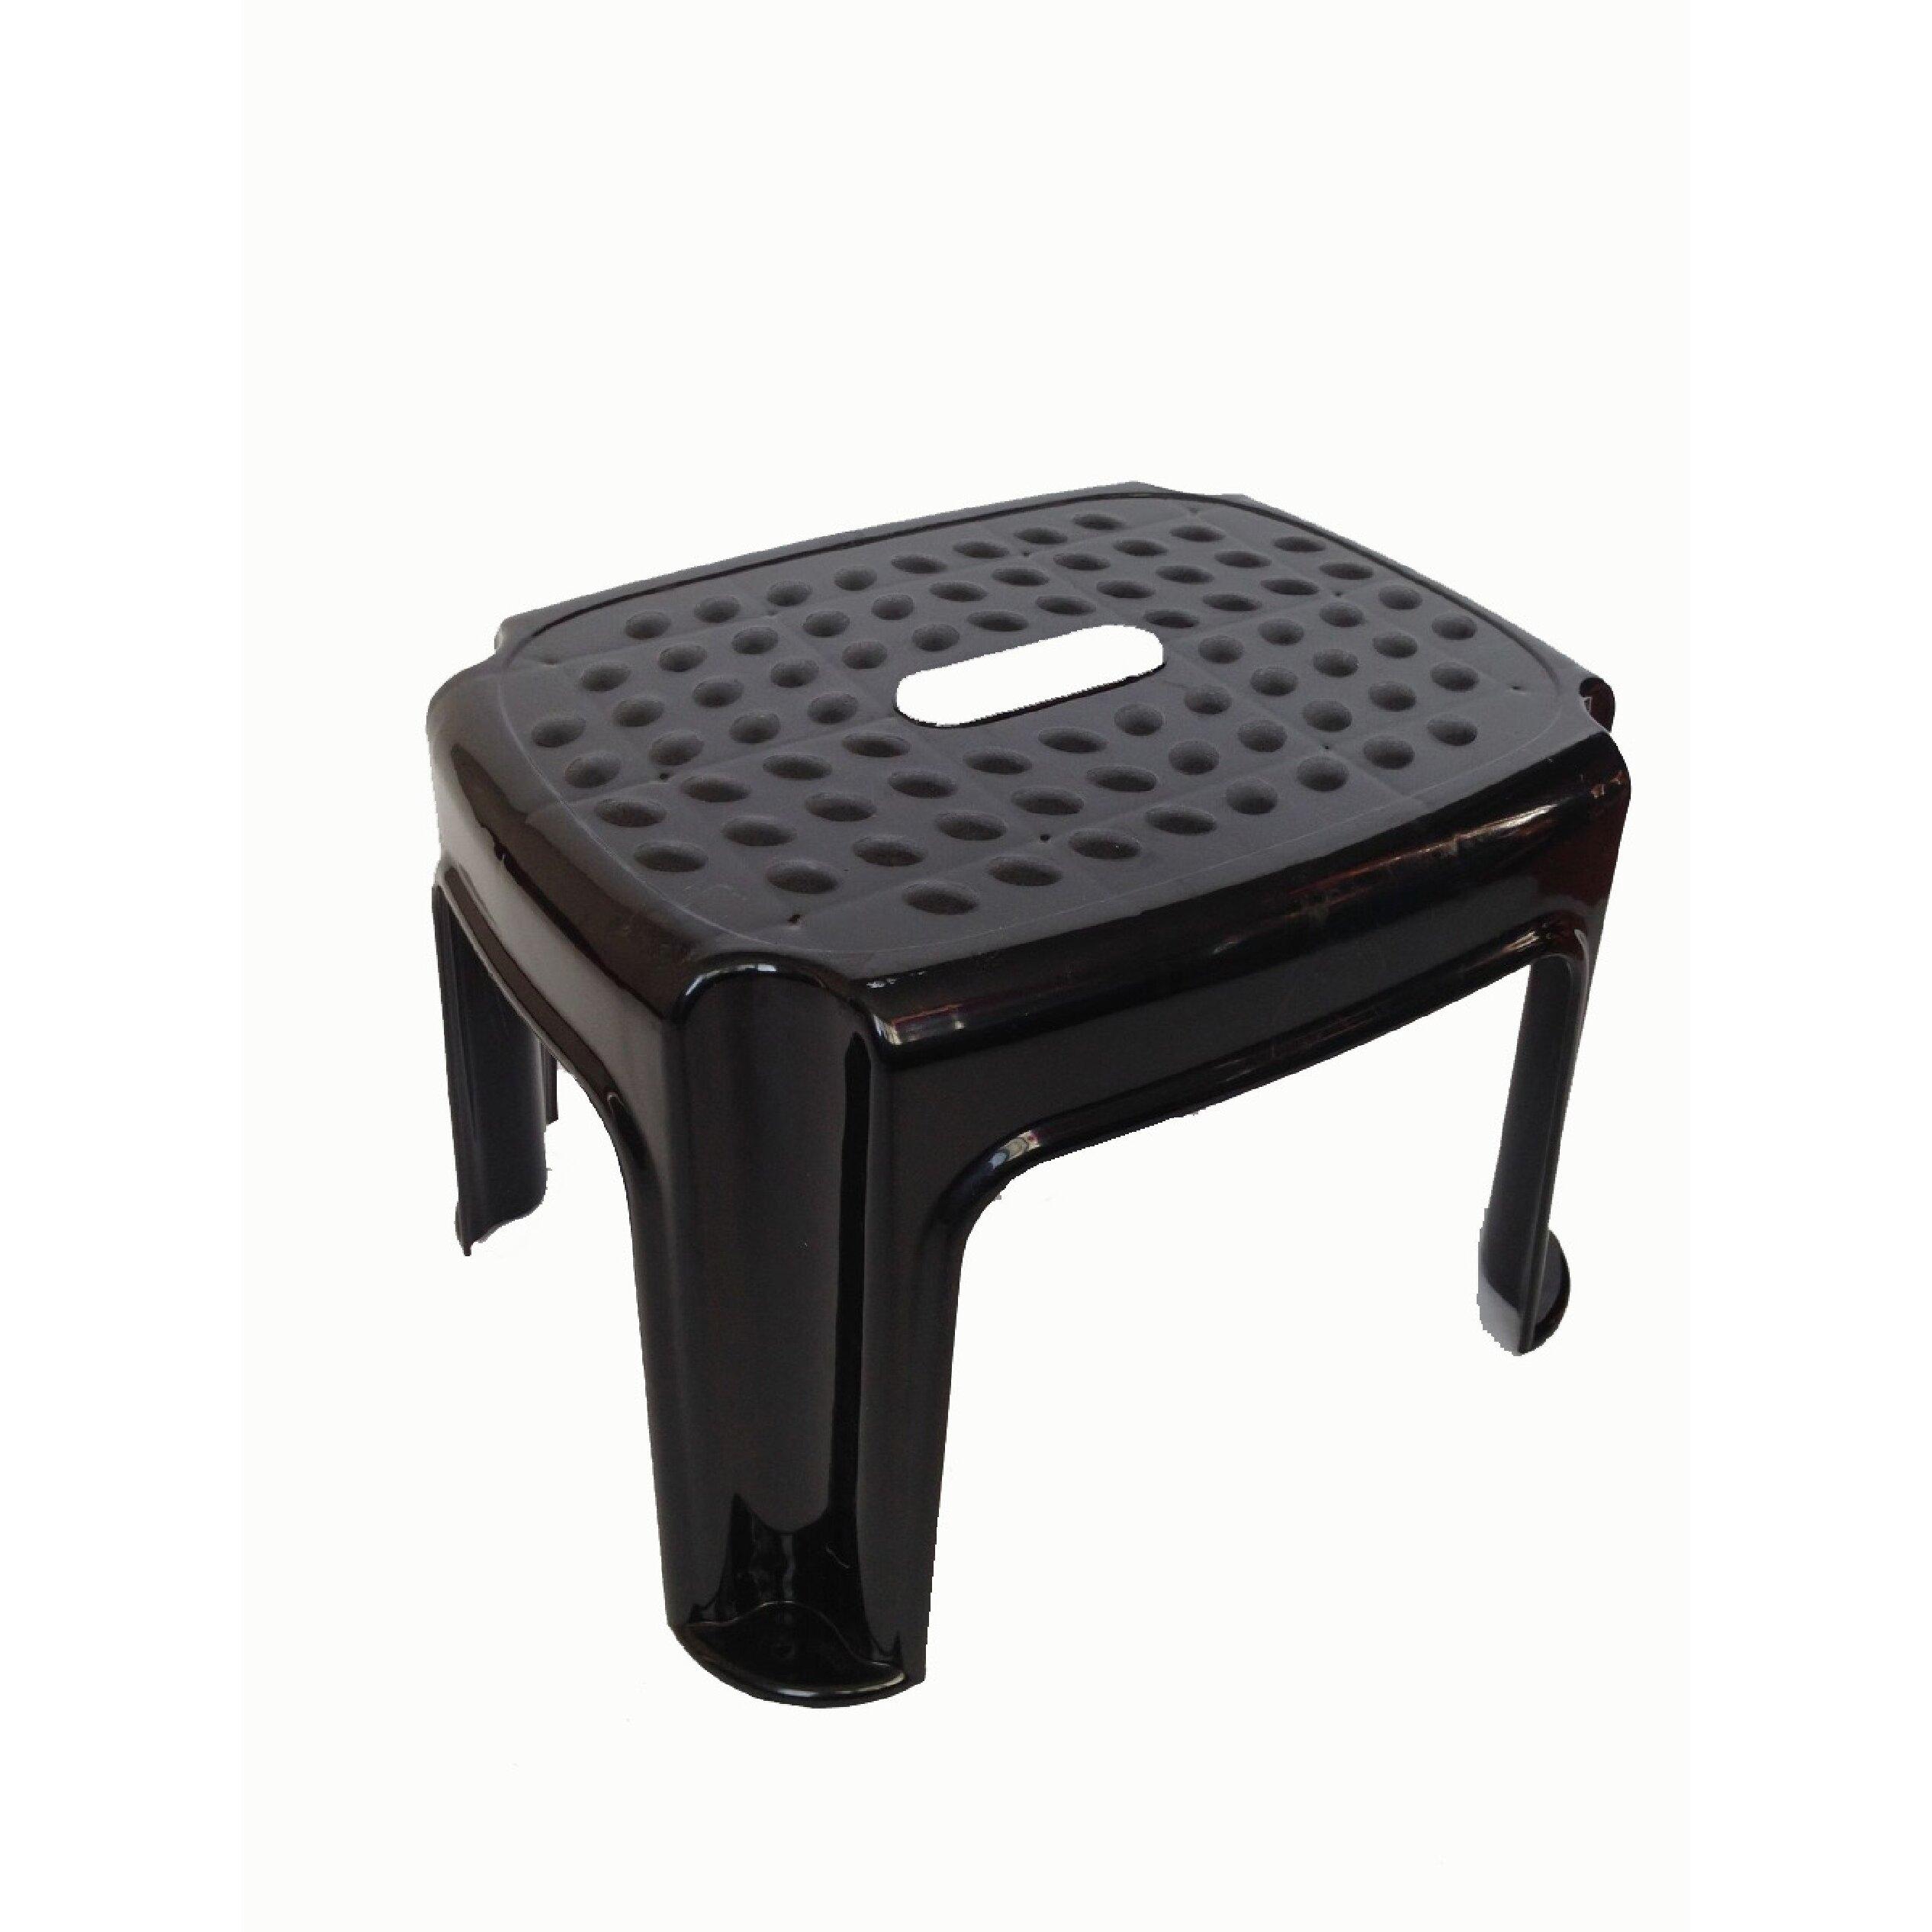 Ybm Home Plastic Step Stool With 400 Lb Load Capacity